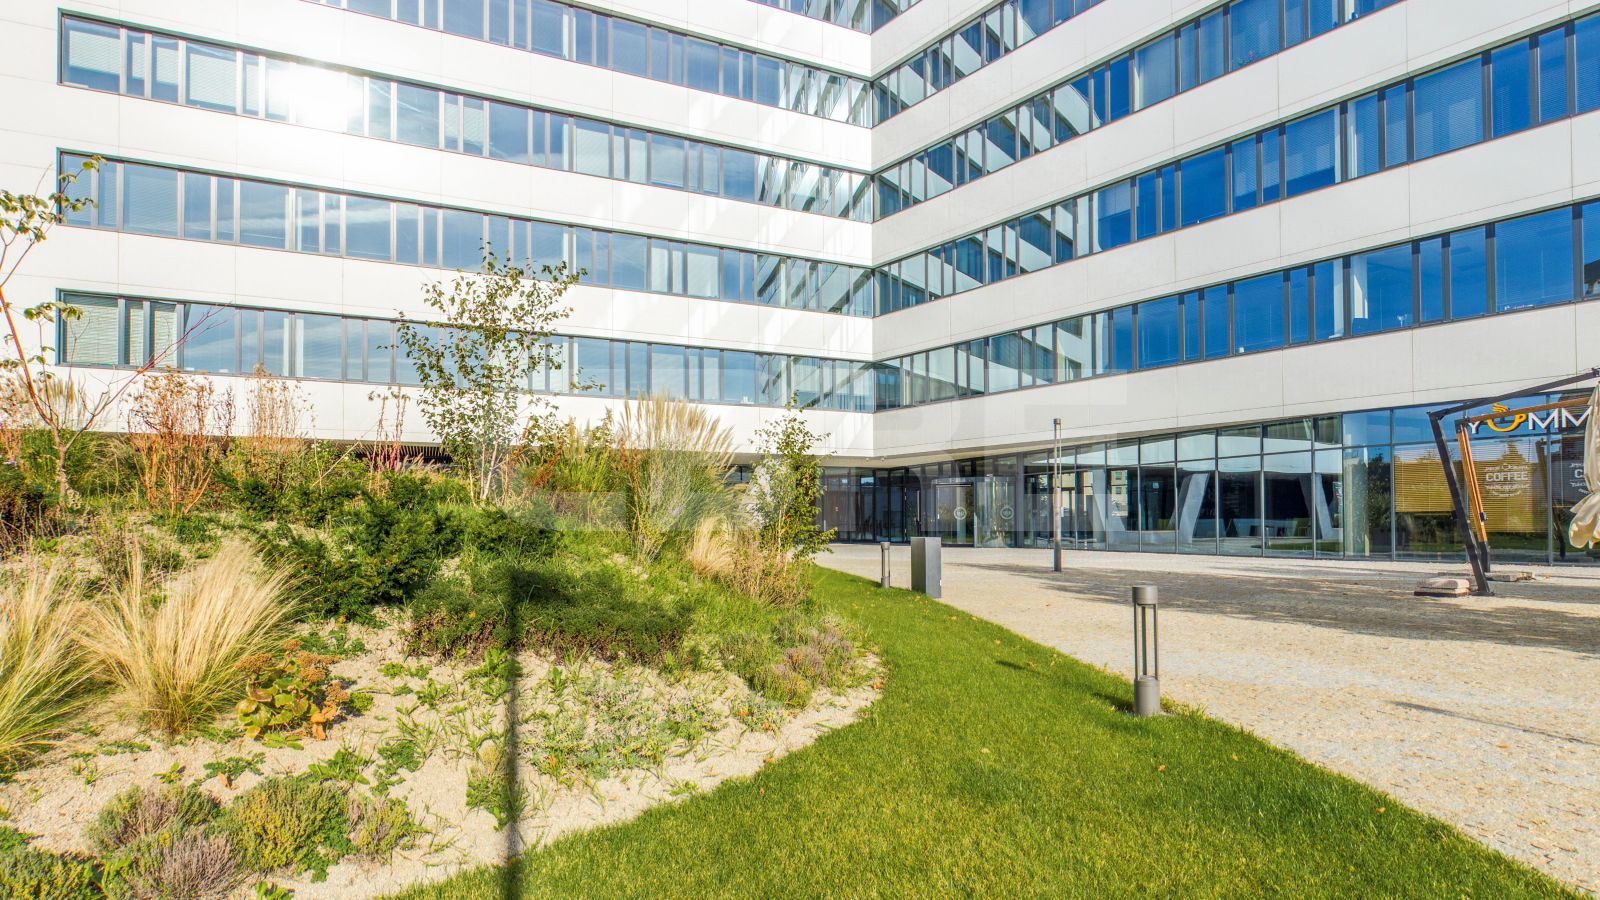 Business Center Tesla II., Košice - Staré Mesto | Offices for rent by CBRE | 5